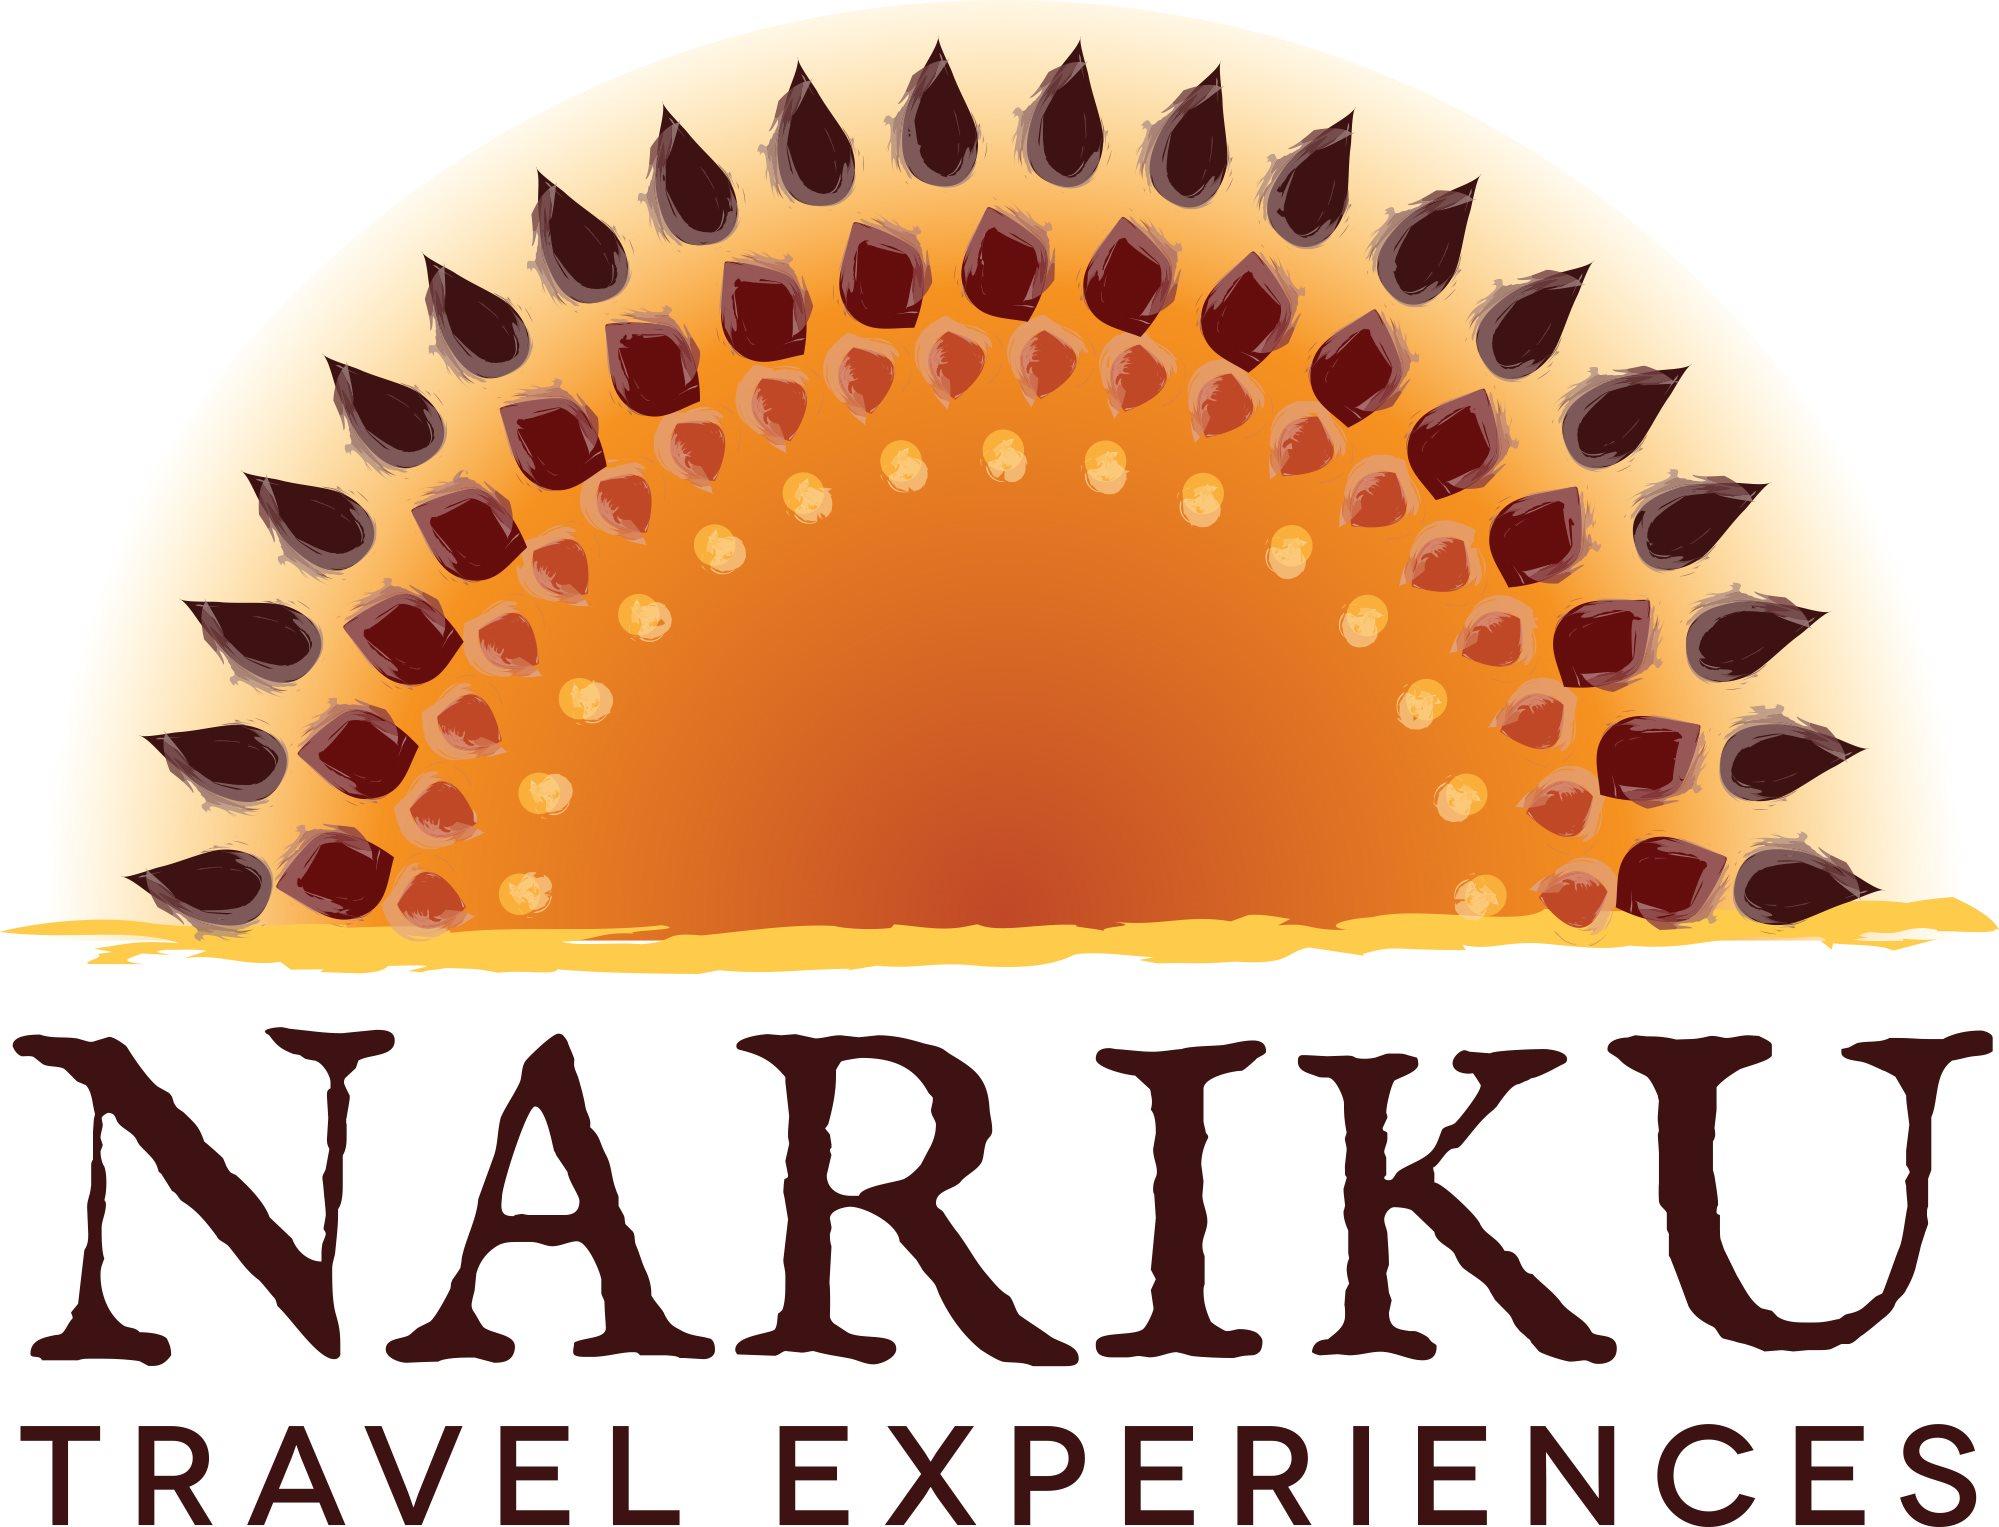 Nariku Travel Experiences